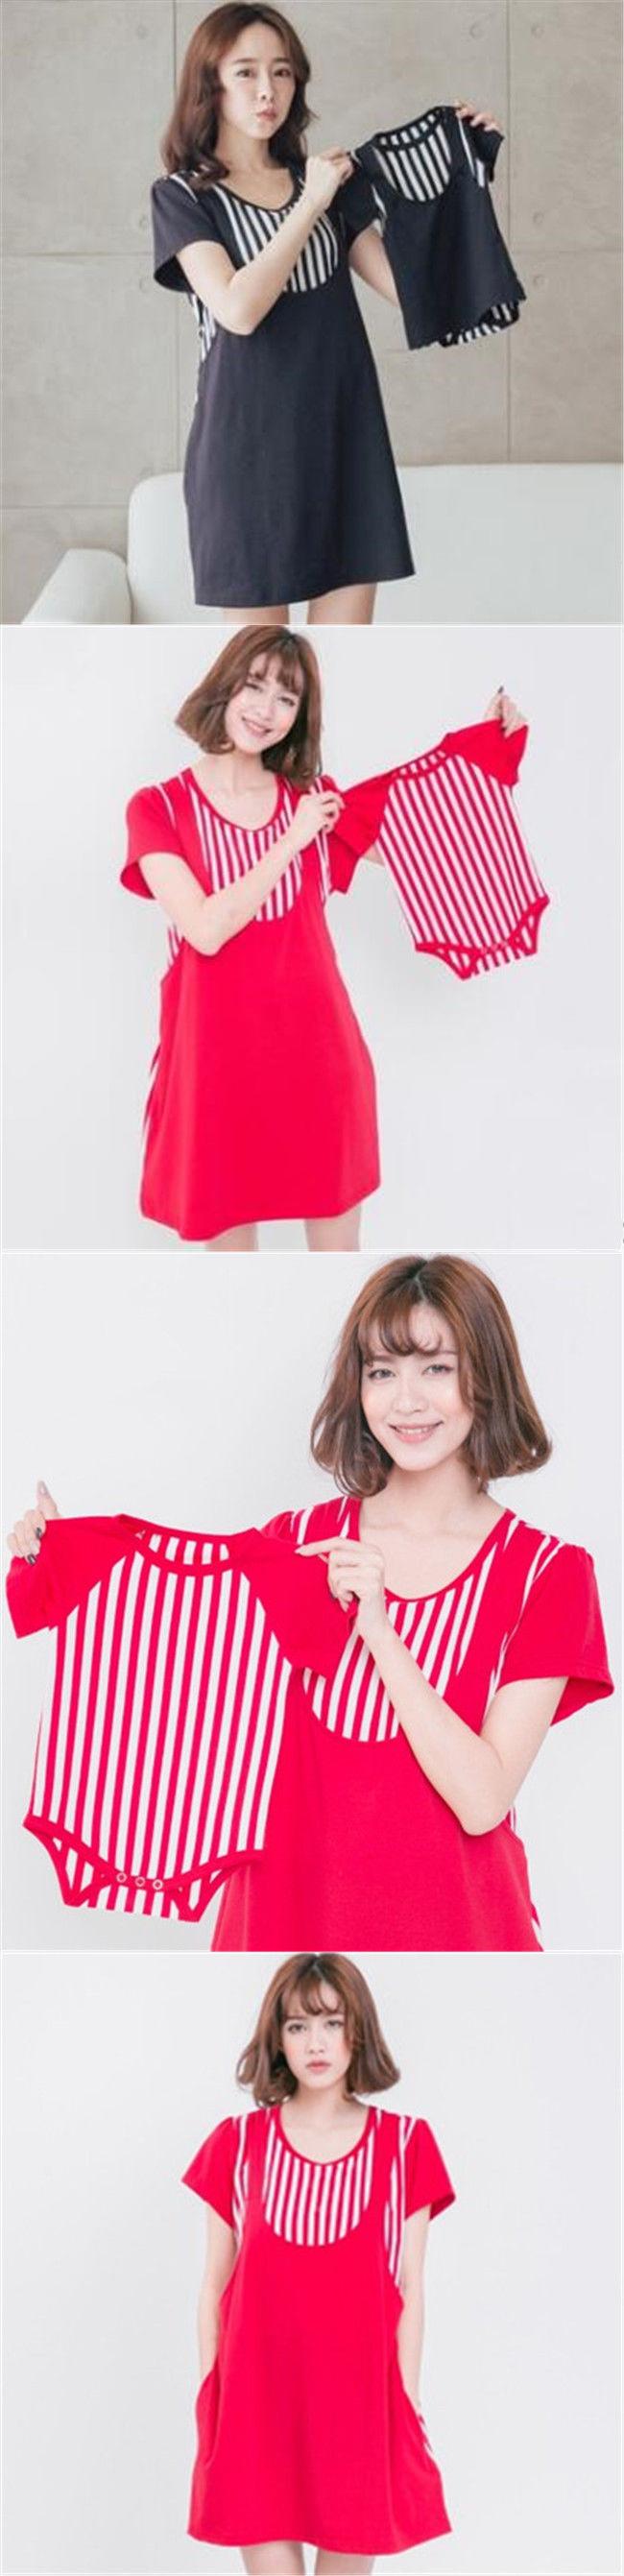 9fd10aaf49c8c Dresses 15752: Maternity Pregnant Women Breastfeeding Nursing Dress+Baby  Clothing Red Dark Blue -> BUY IT NOW ONLY: $30.39 on eBay!